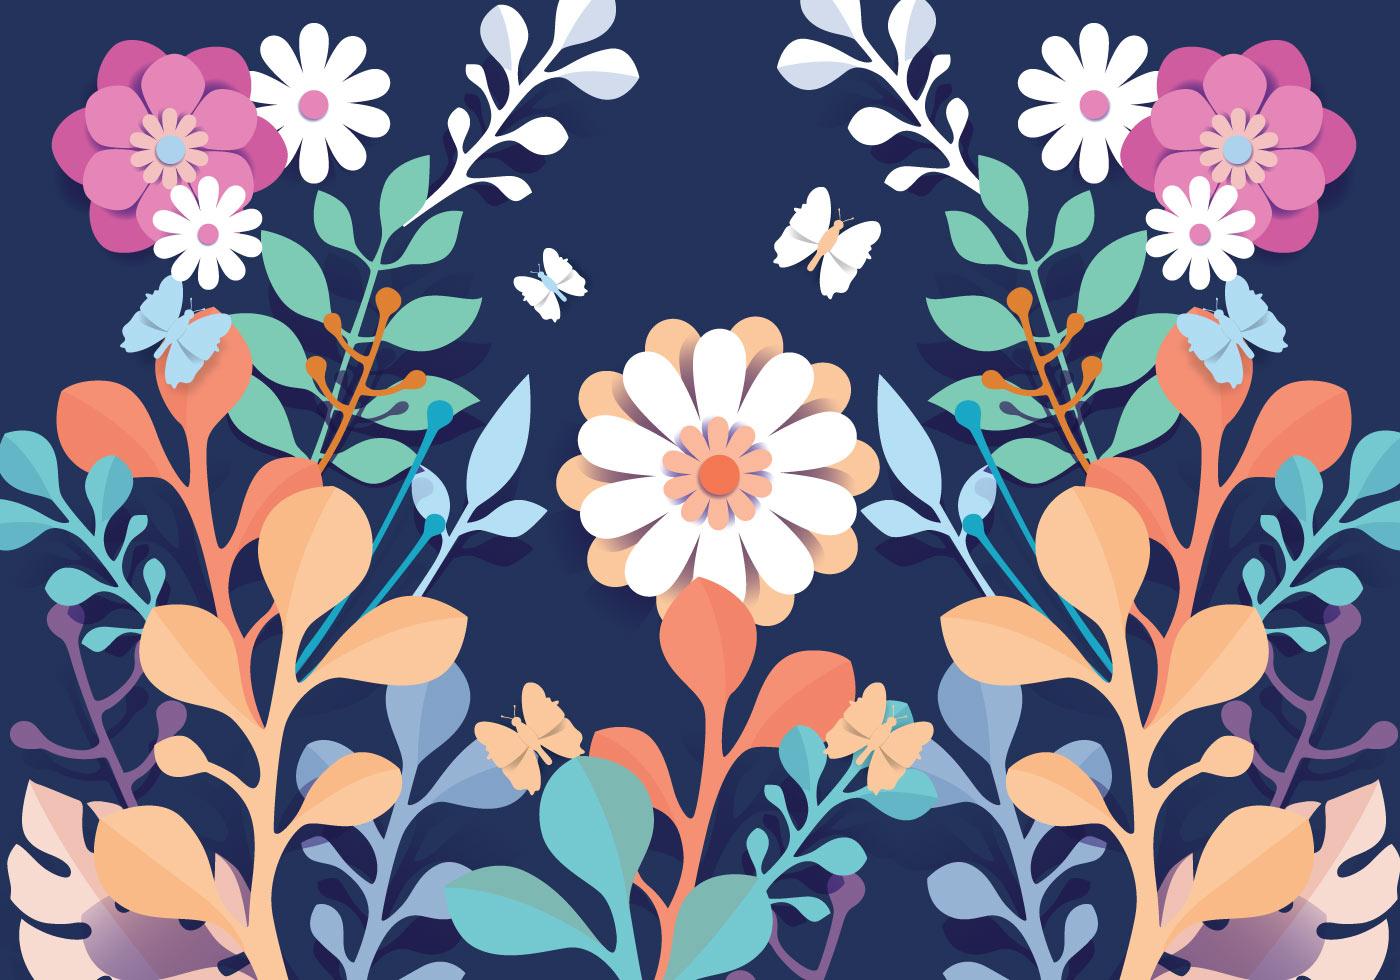 3d floral papercraft pattern flowers vector